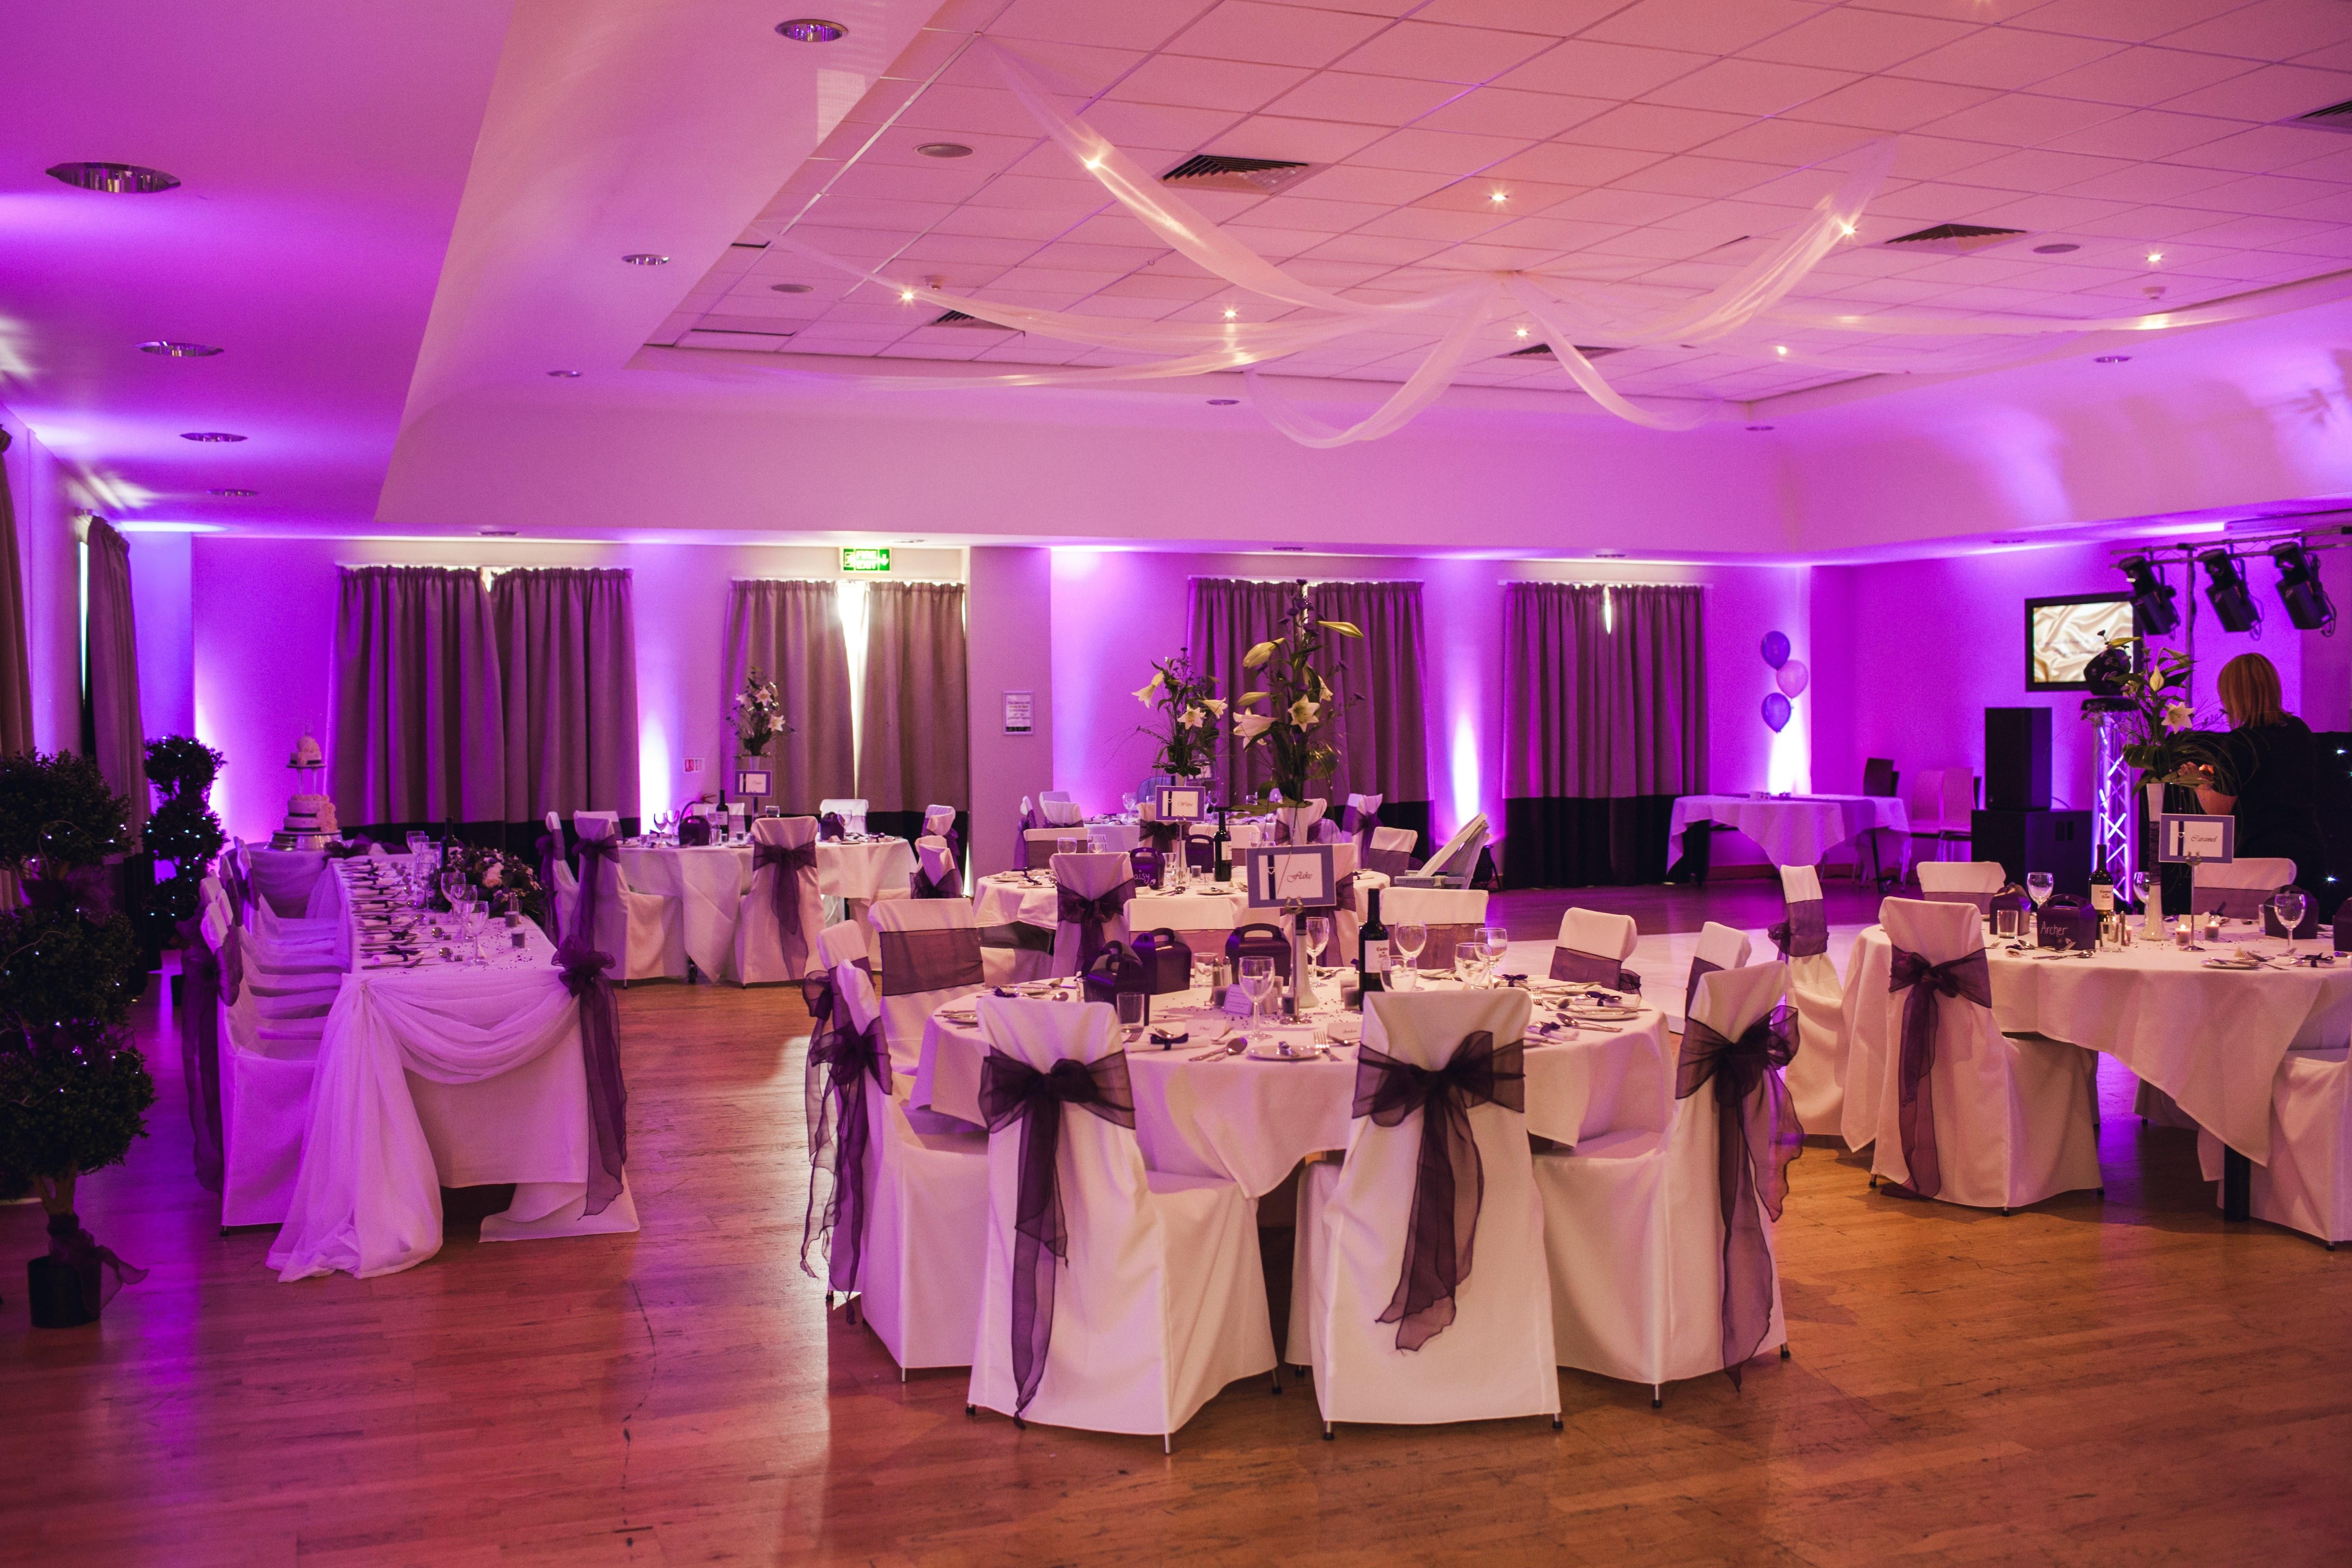 Jc Wedding And Party Services | Wedding Venue Decorators - Brierley ...